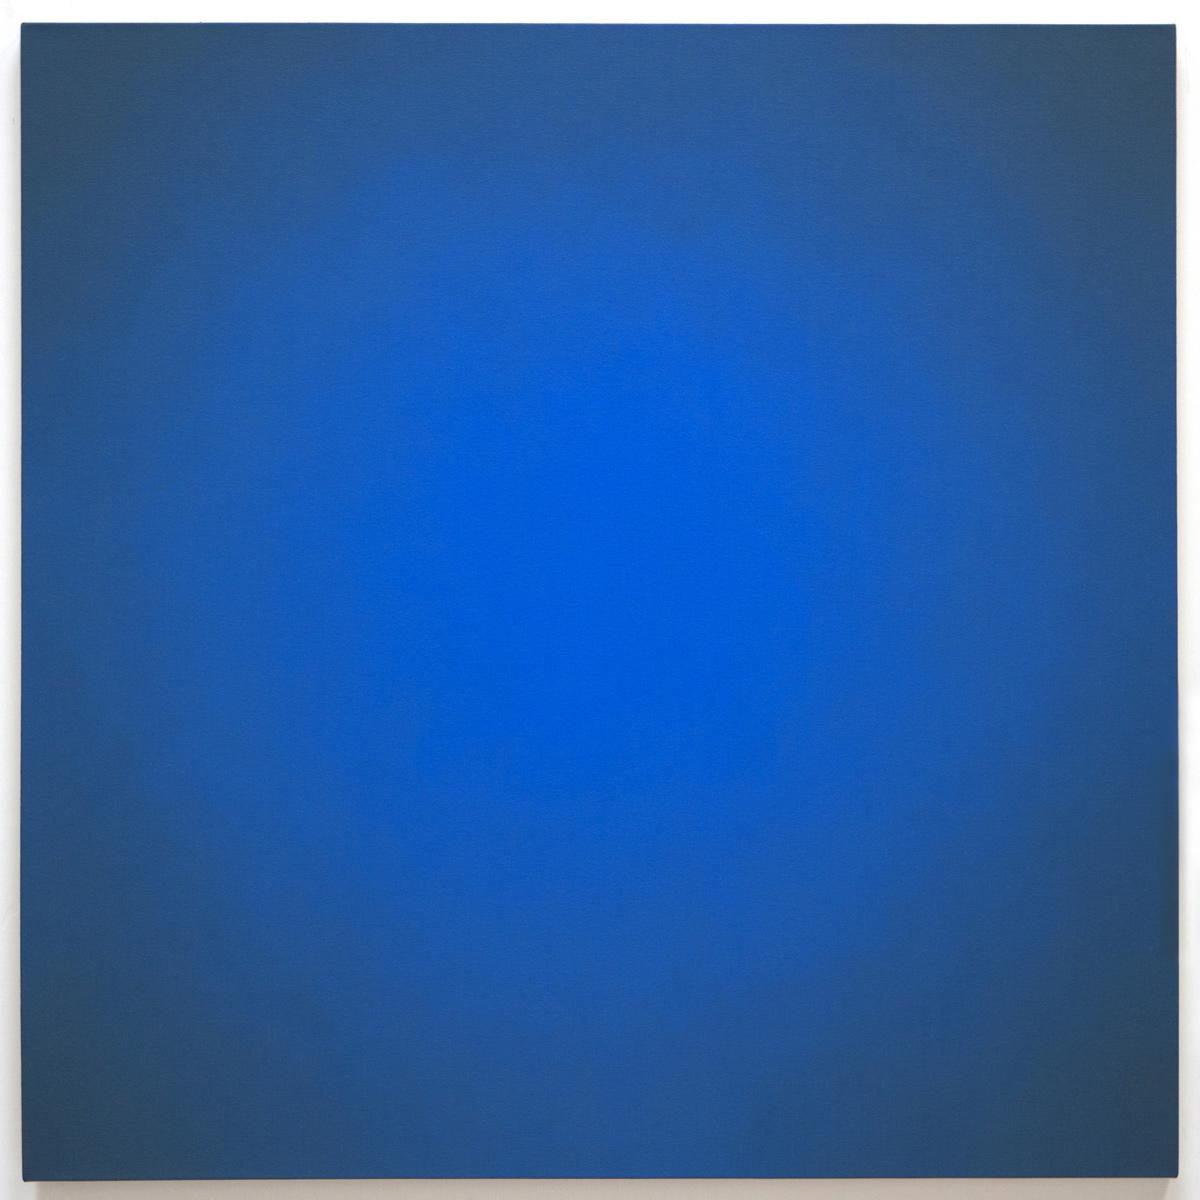 Blue Orange #4 (Orange), Equivalence Blue Orange Series, 2005, oil on canvas, 30 x 30 in. (76 x 76 cm.)